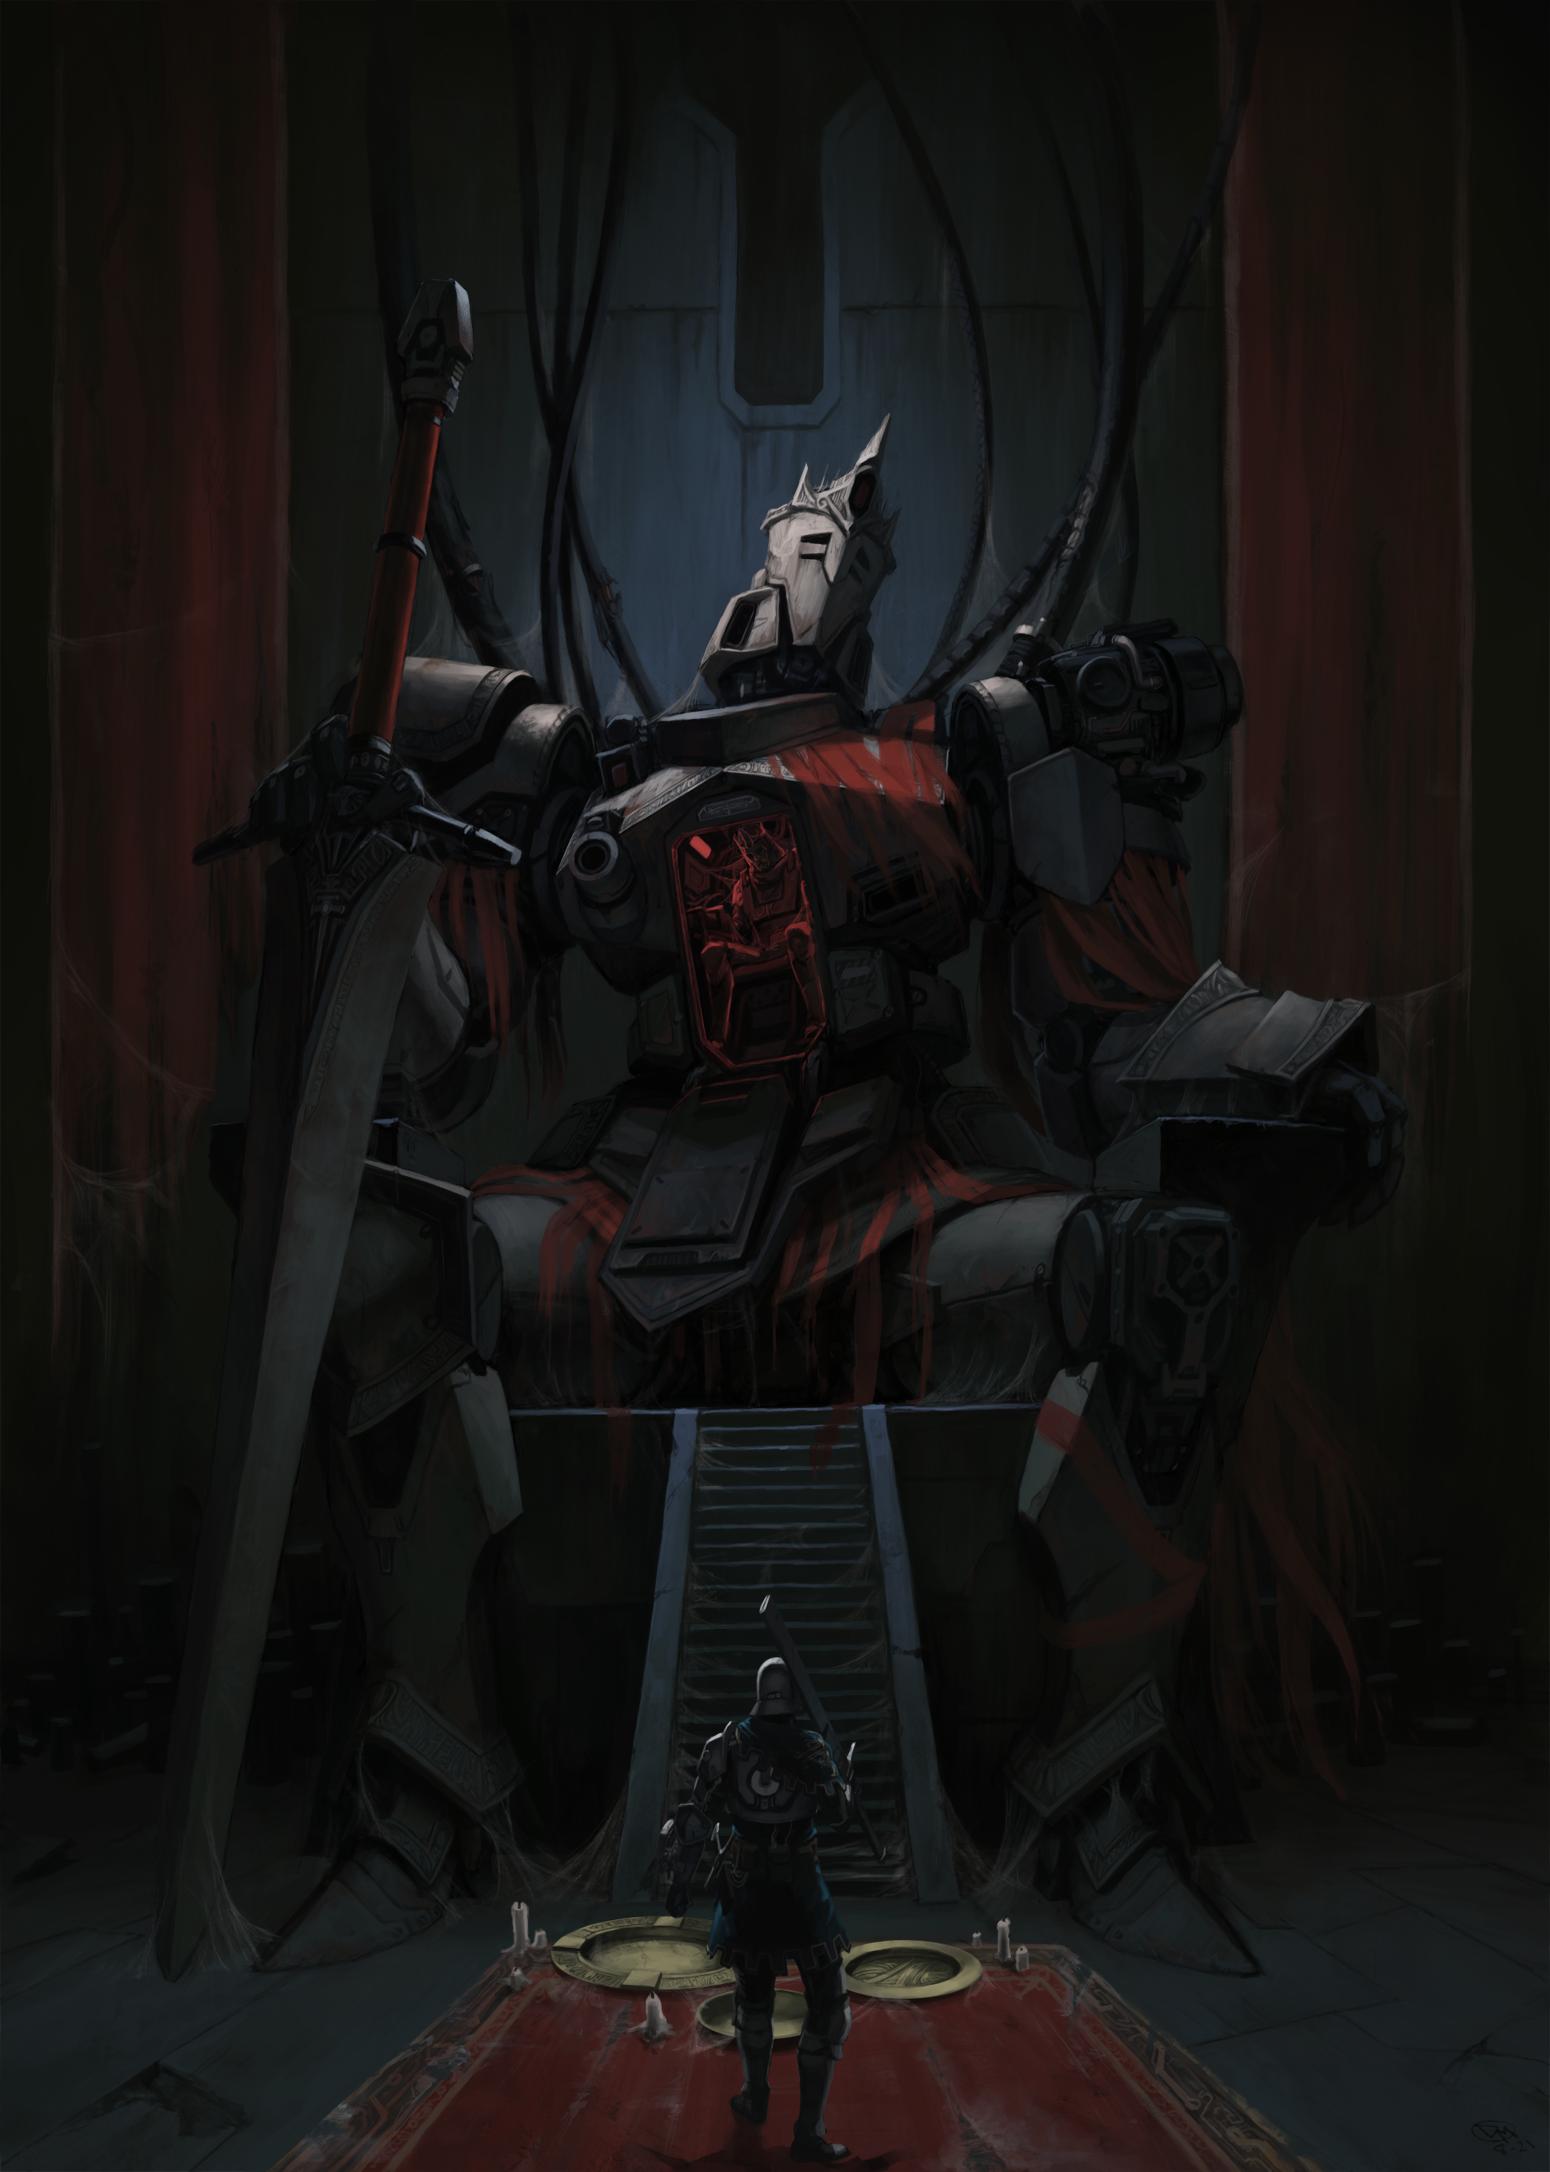 The Derelict Throne